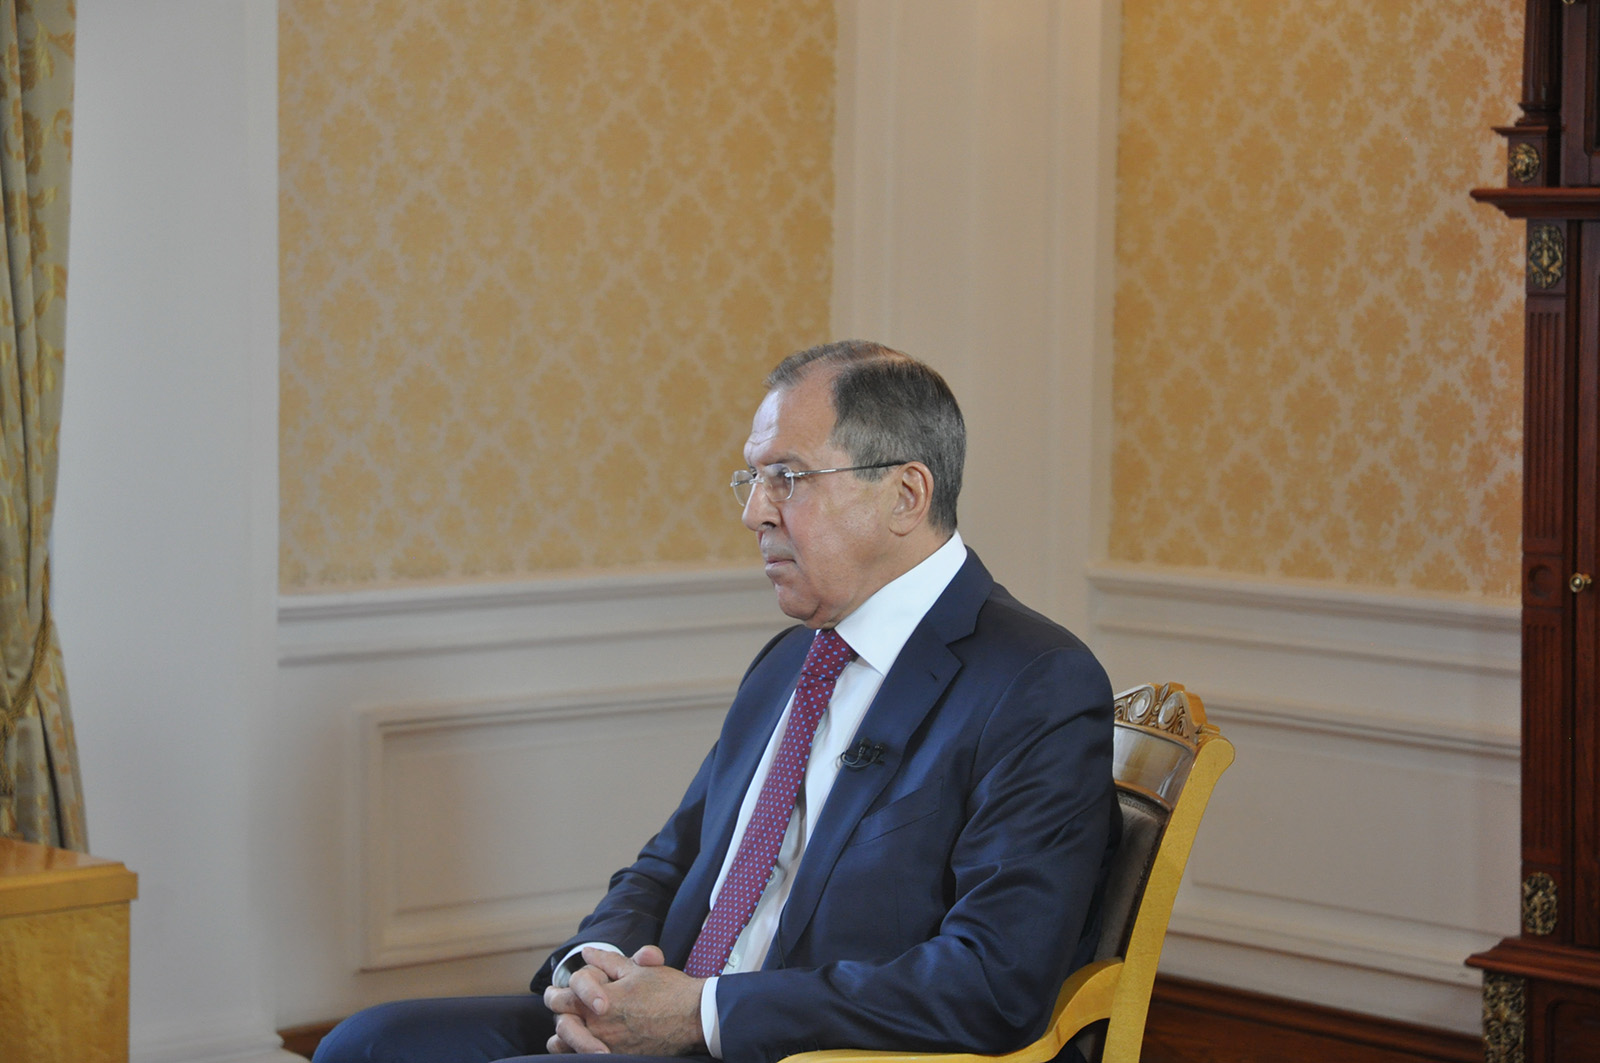 Foreign Minister Sergey Lavrov's interview with Rossiya Segodnya